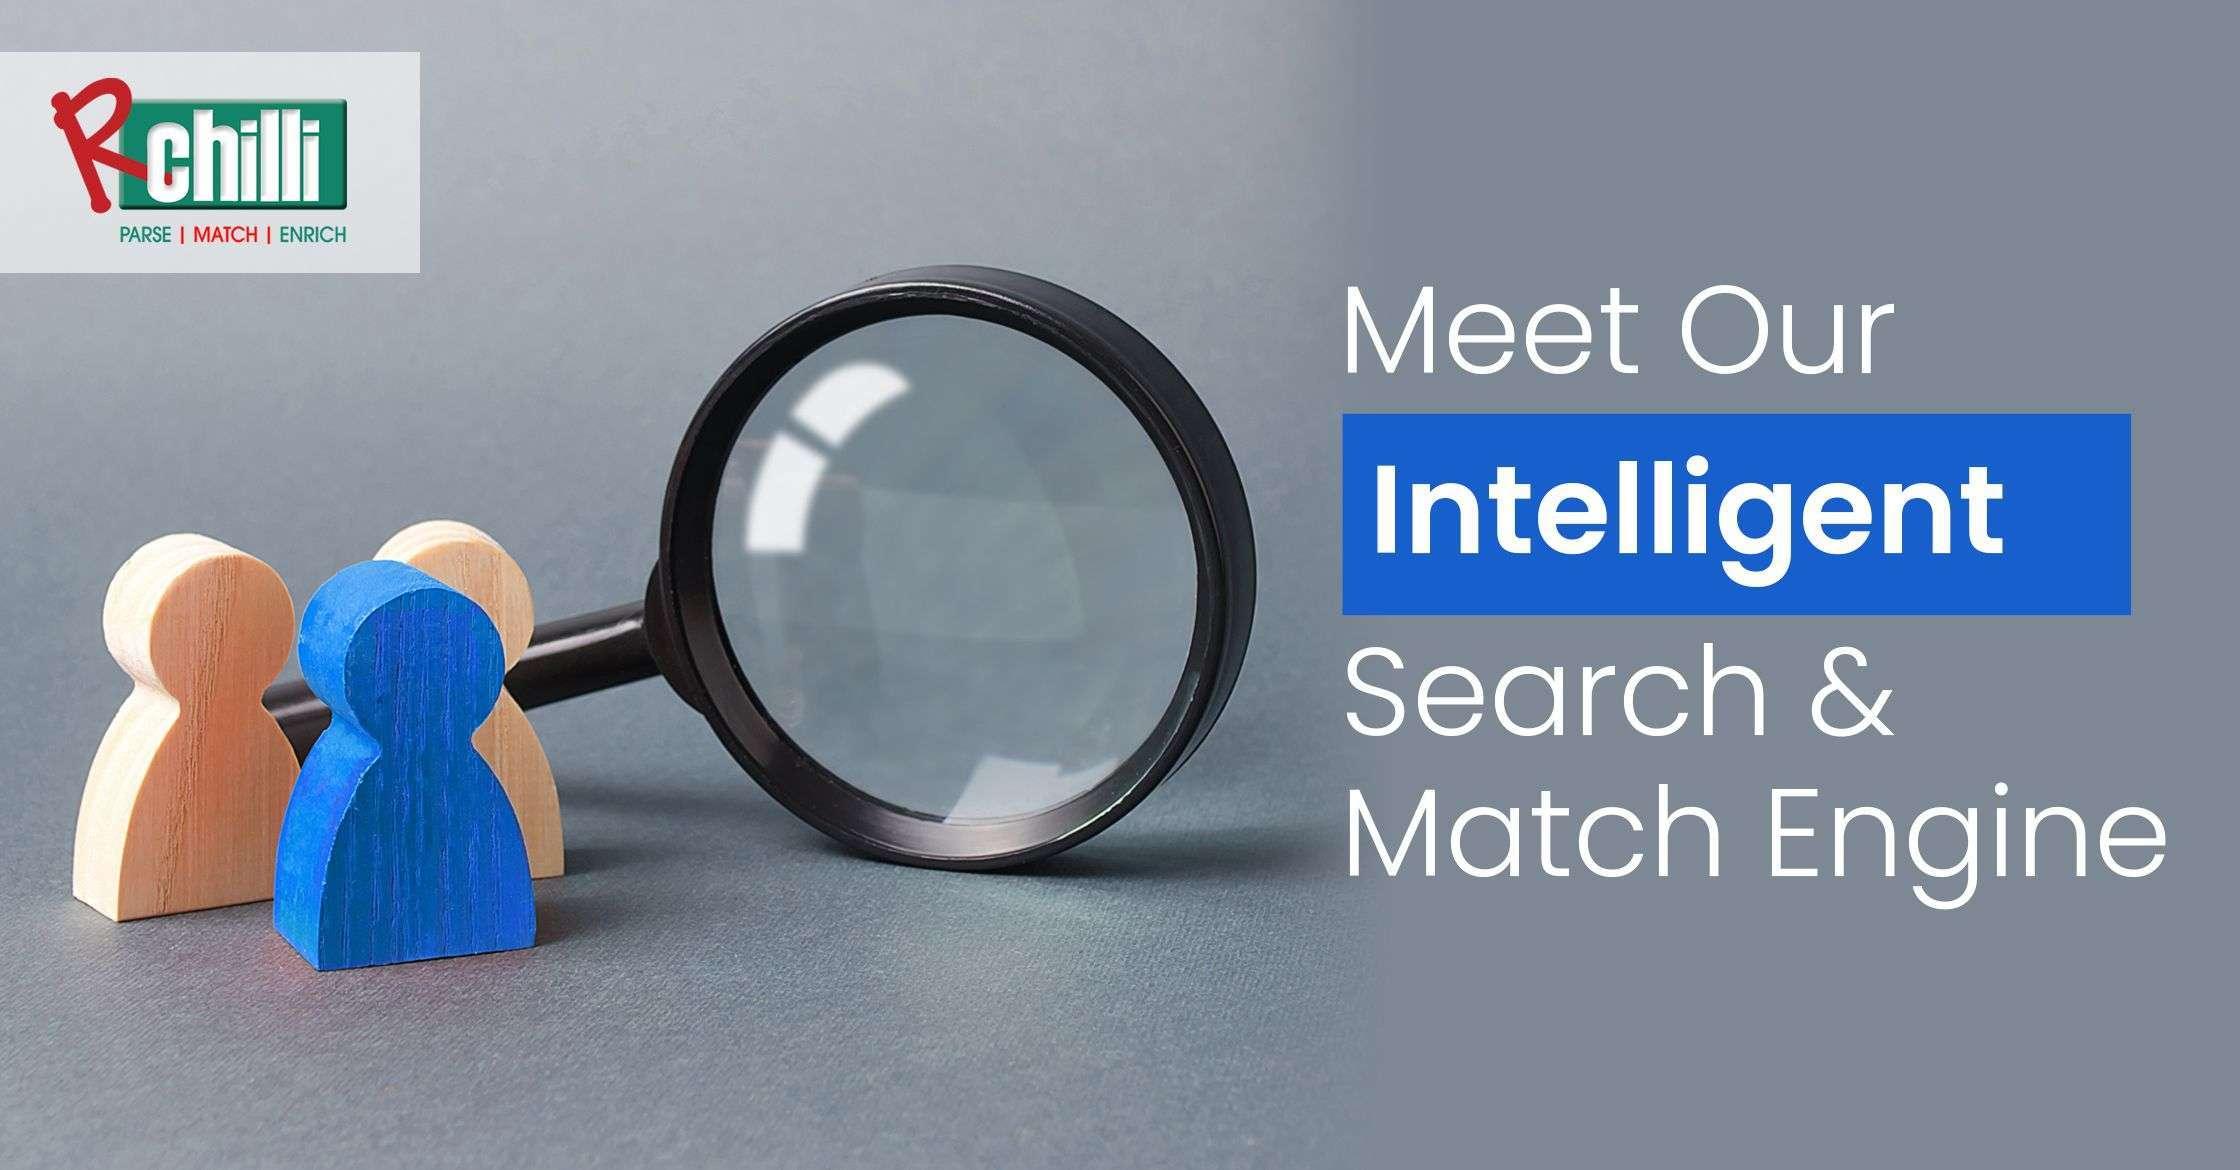 RChilli Search & Match Engine-AI CV/Job Matching to select high quality candidates